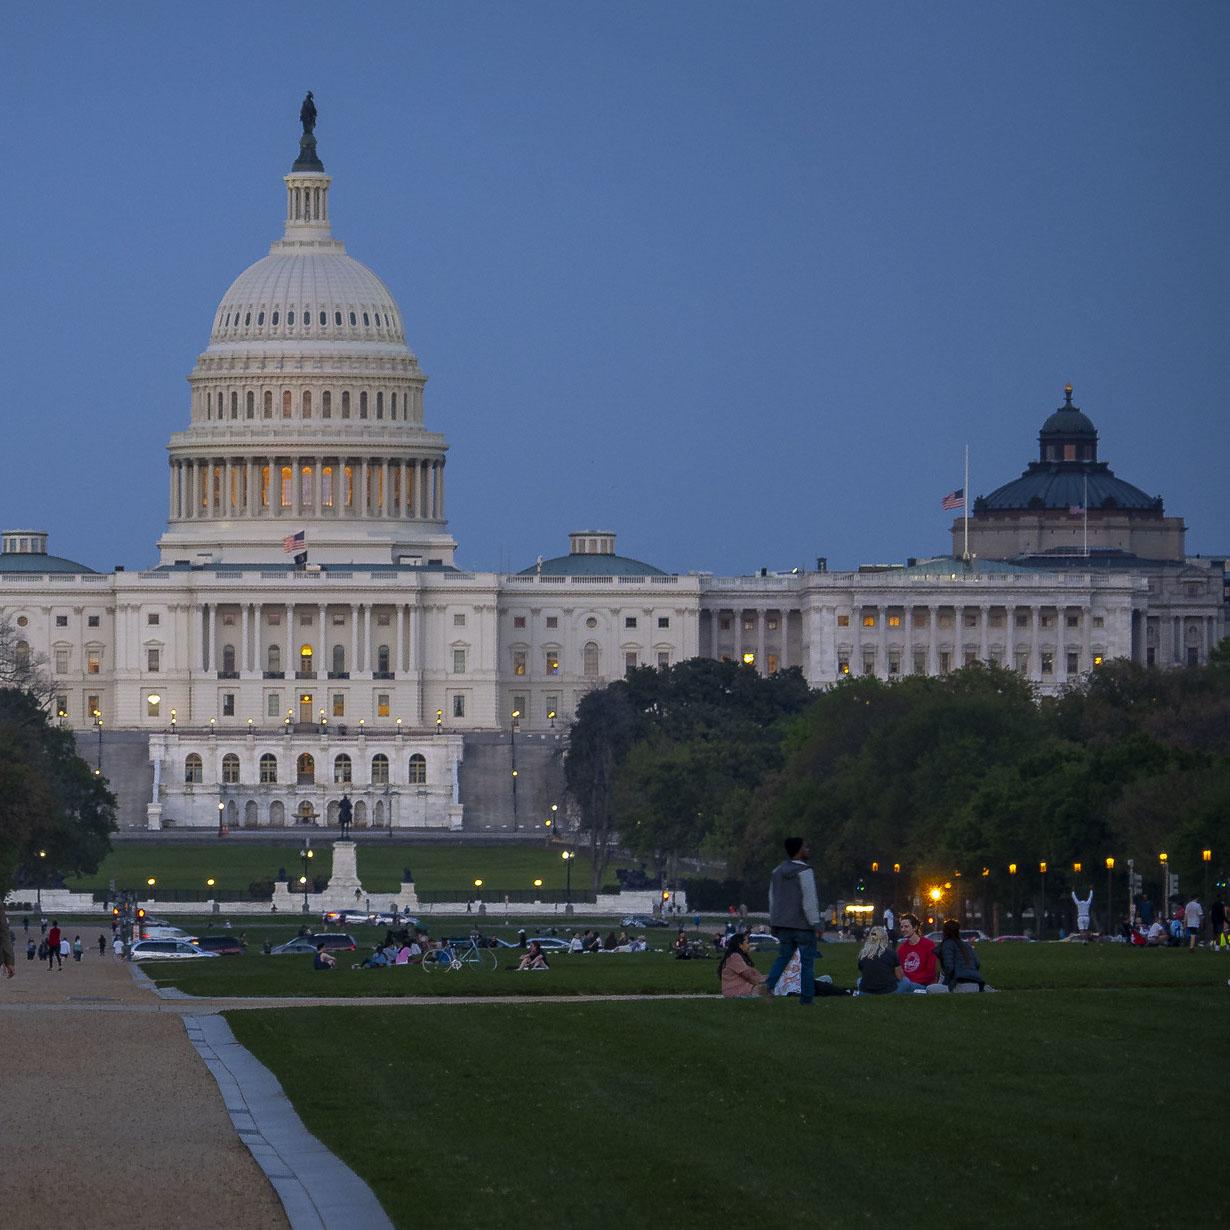 Capital building, Washington d.c.